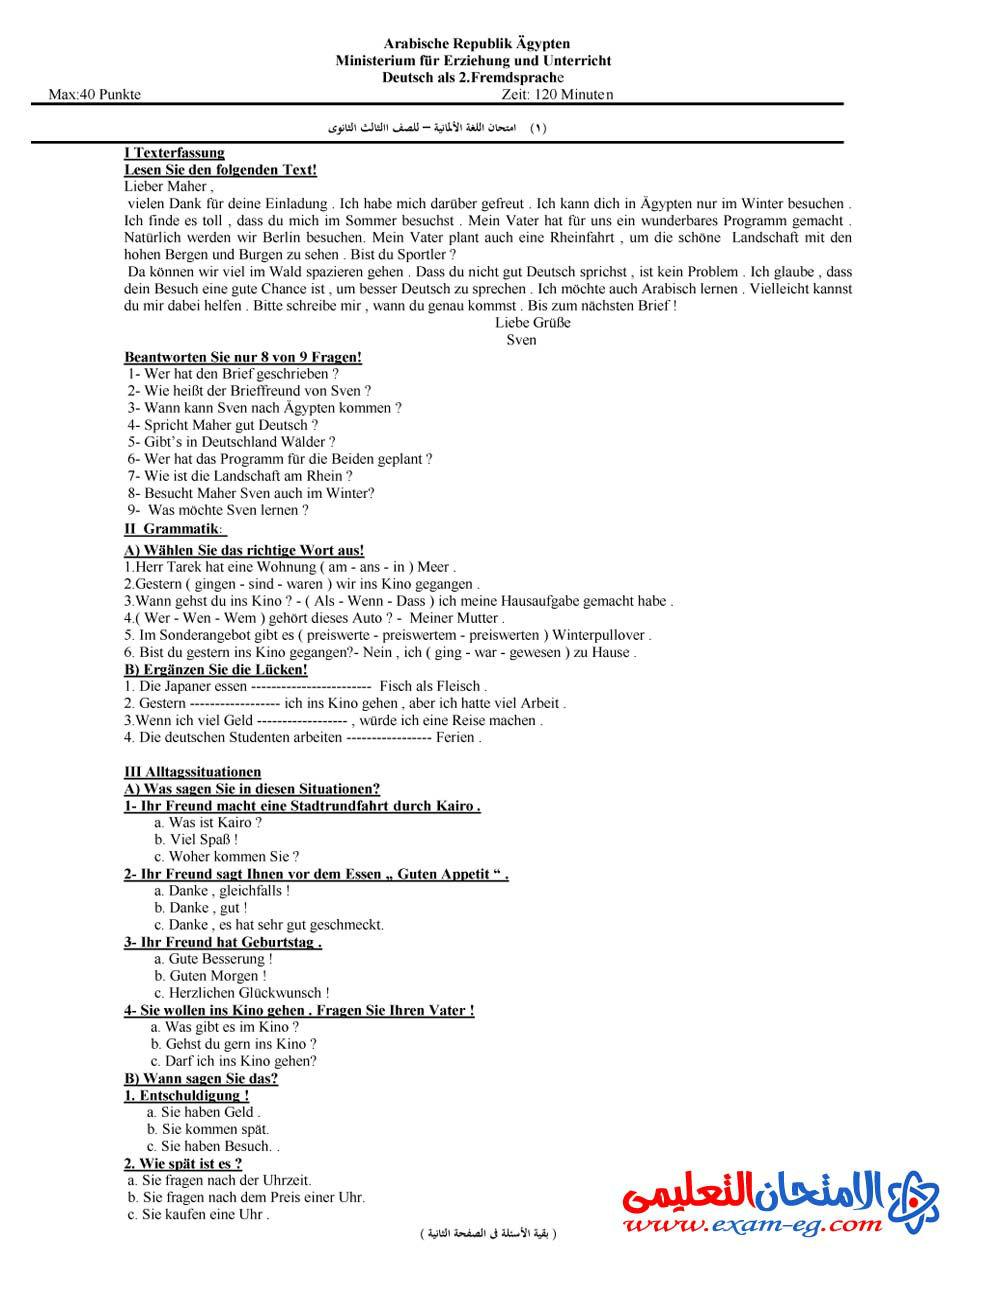 exam-eg.com_1396621281631.jpg